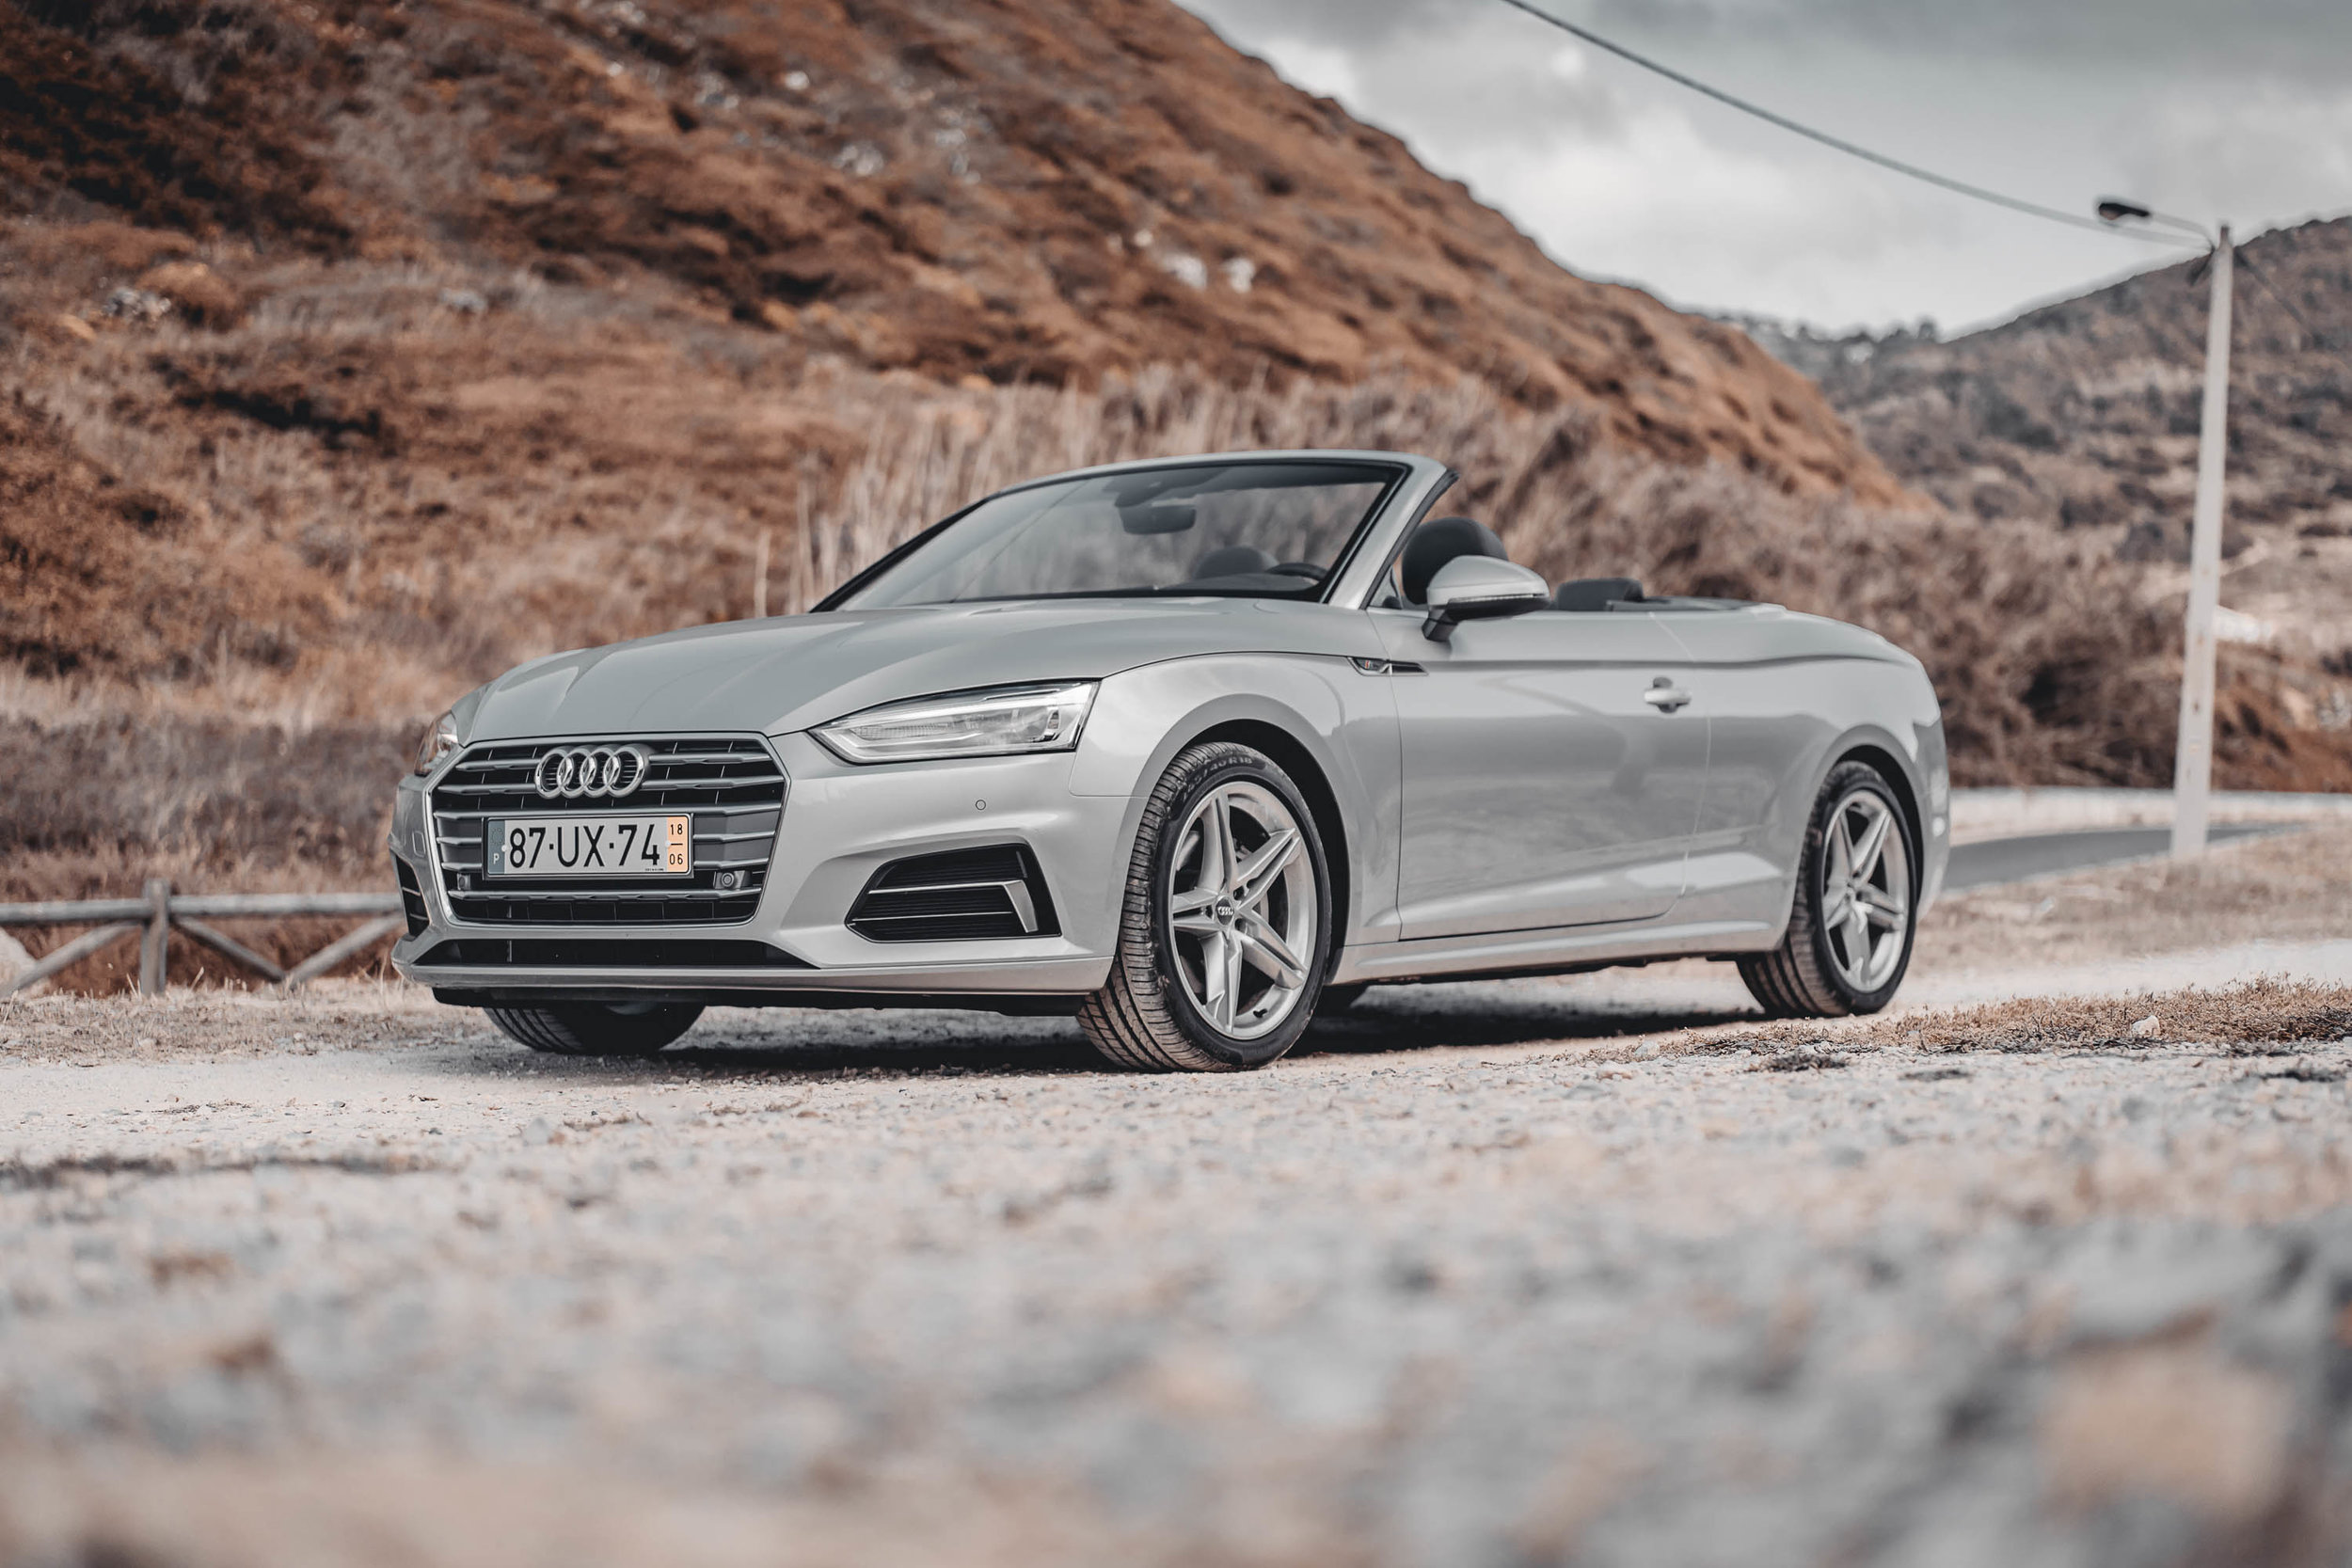 Maximilian_Otto_Audi_A5_Cabriolet_Portugal_10_WEB.jpg